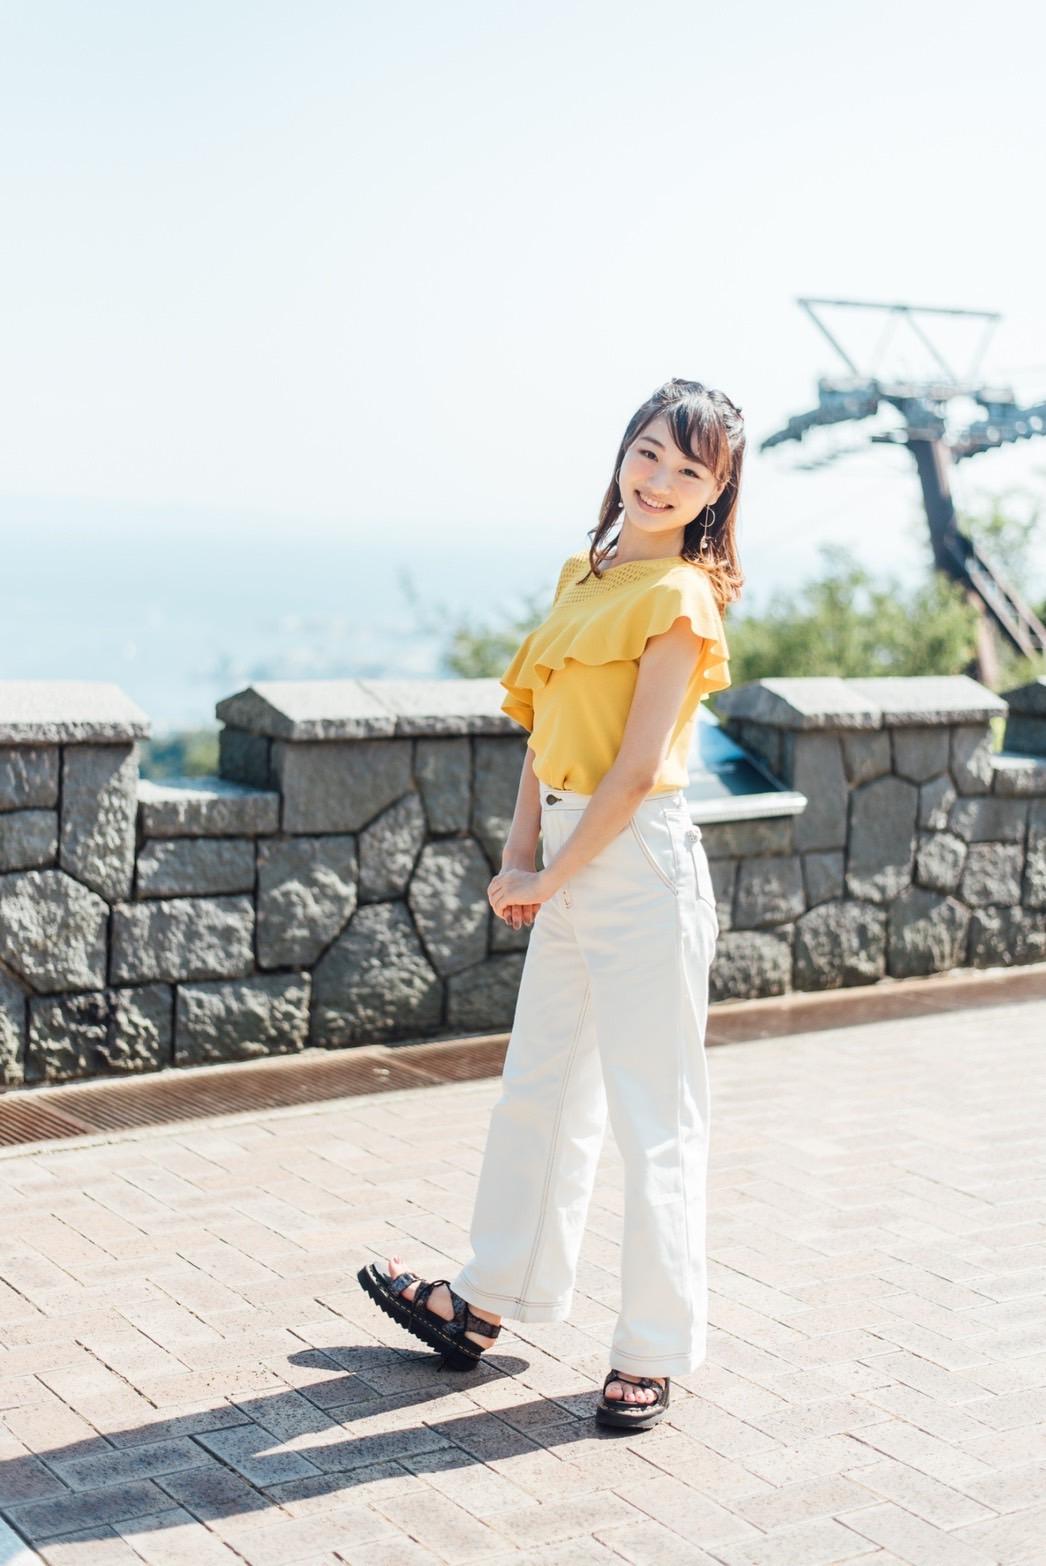 Entry No.5 大石乃愛